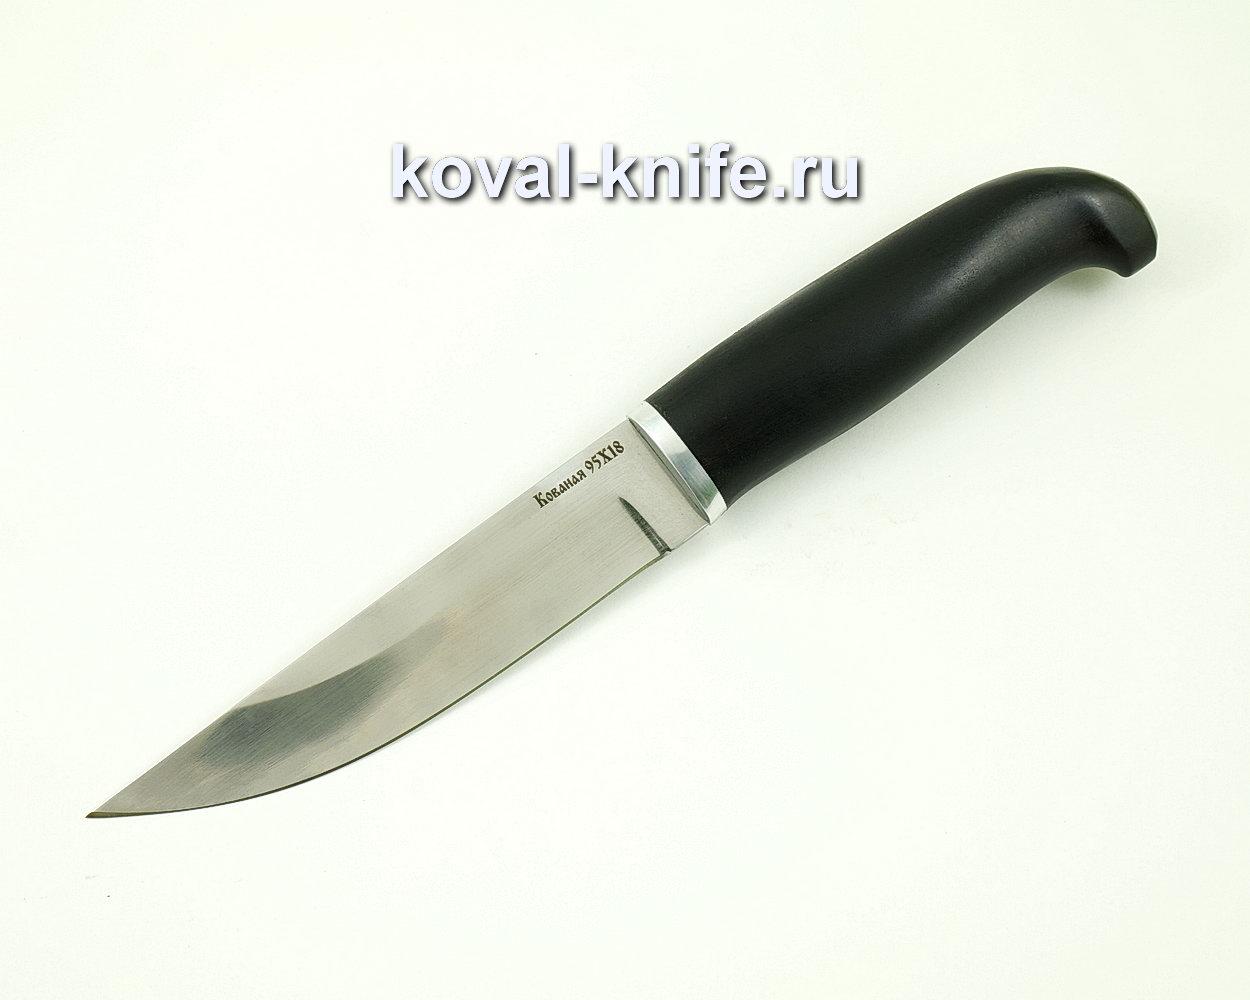 Нож Лис из стали 95х18 (рукоять граб) A410